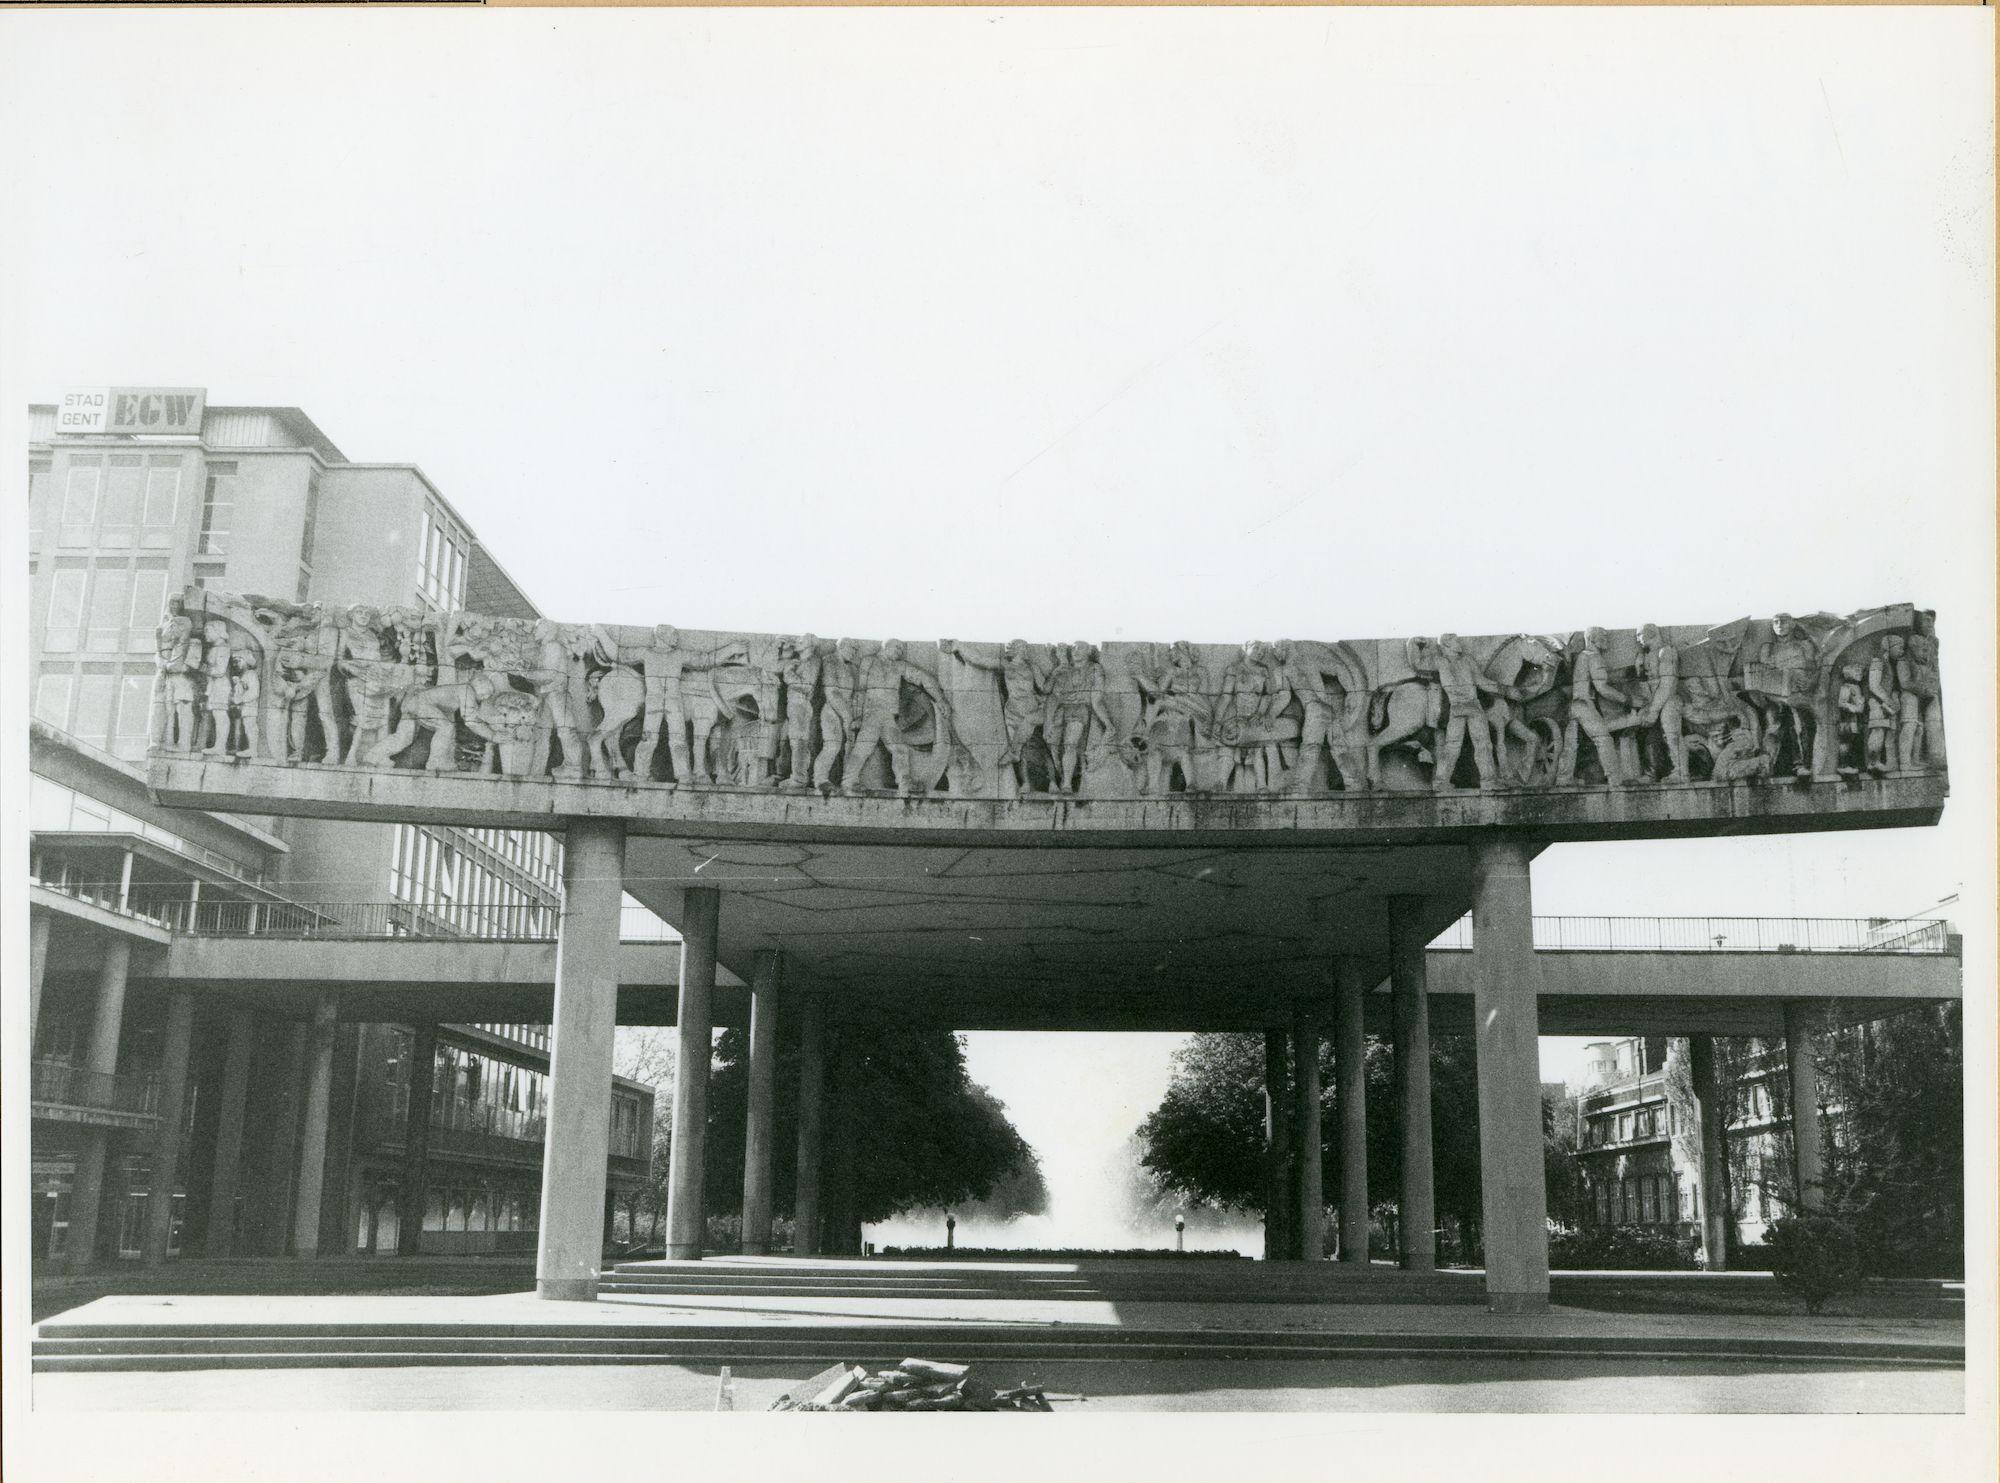 Gent: Woodrow Wilsonplein: monumentale fries (beeldhouwwerk), 1980